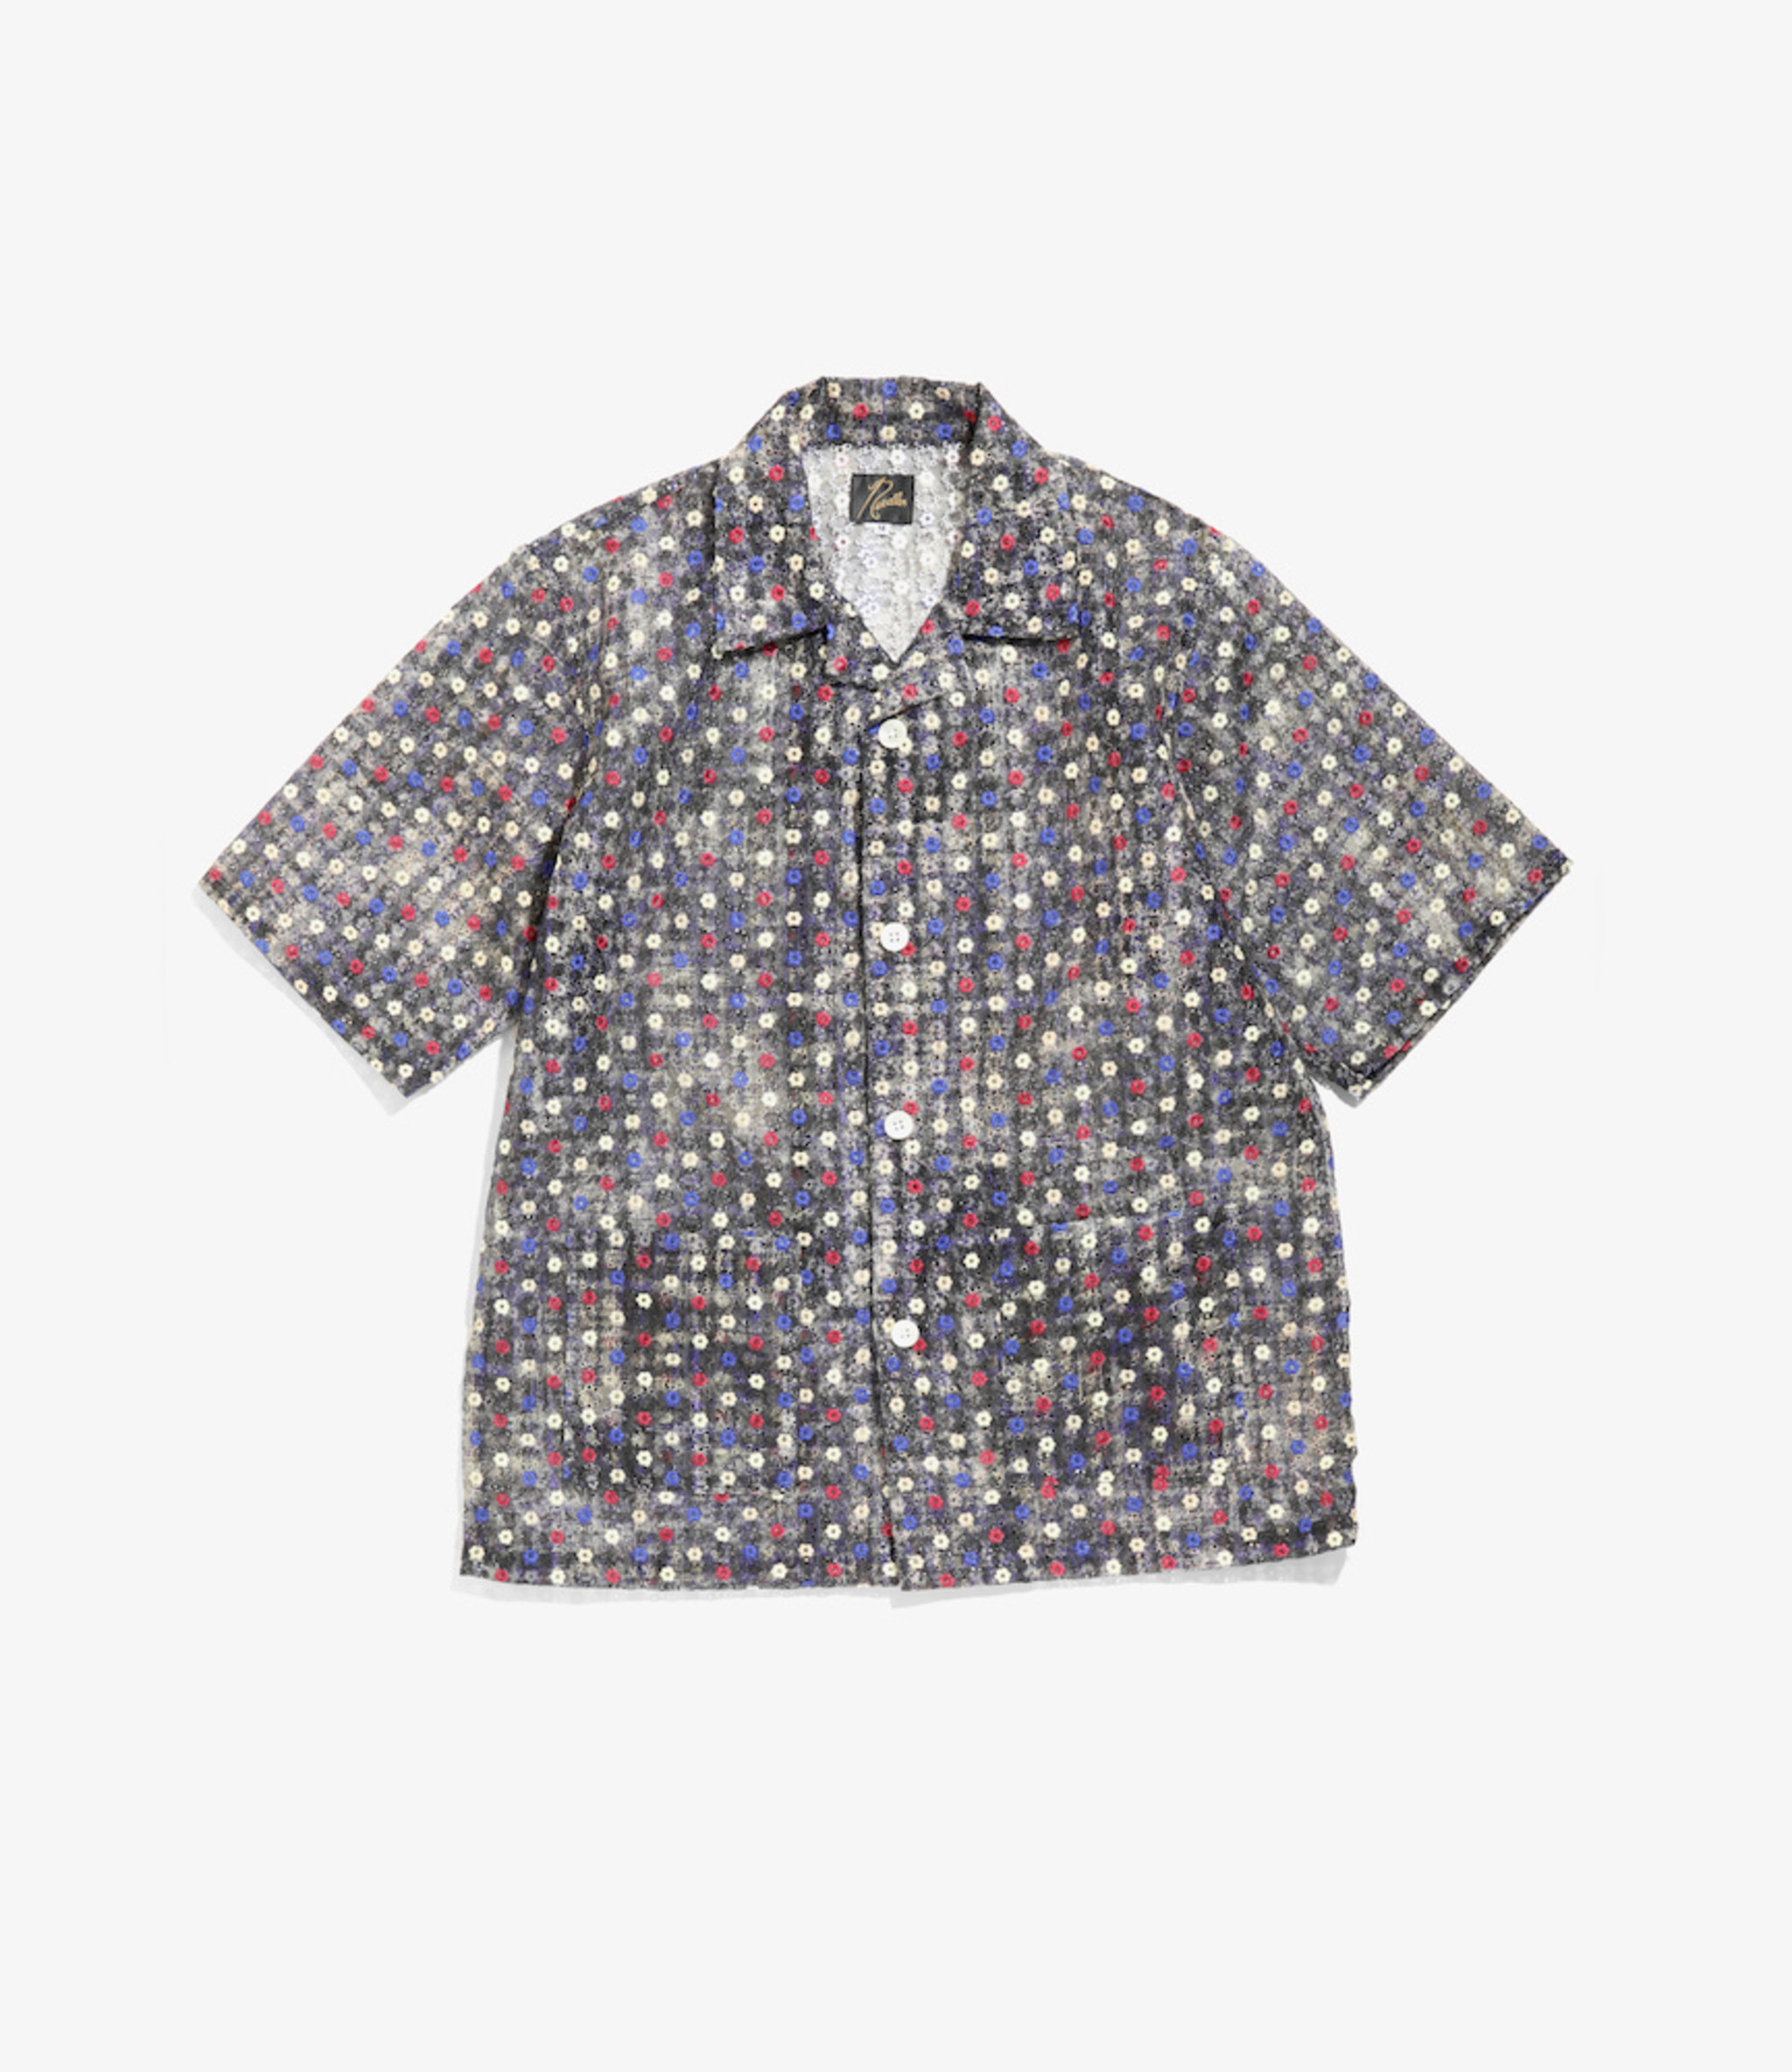 Needles Cabana Shirt - Poly Organdy Cloth / Floret Emb - Black